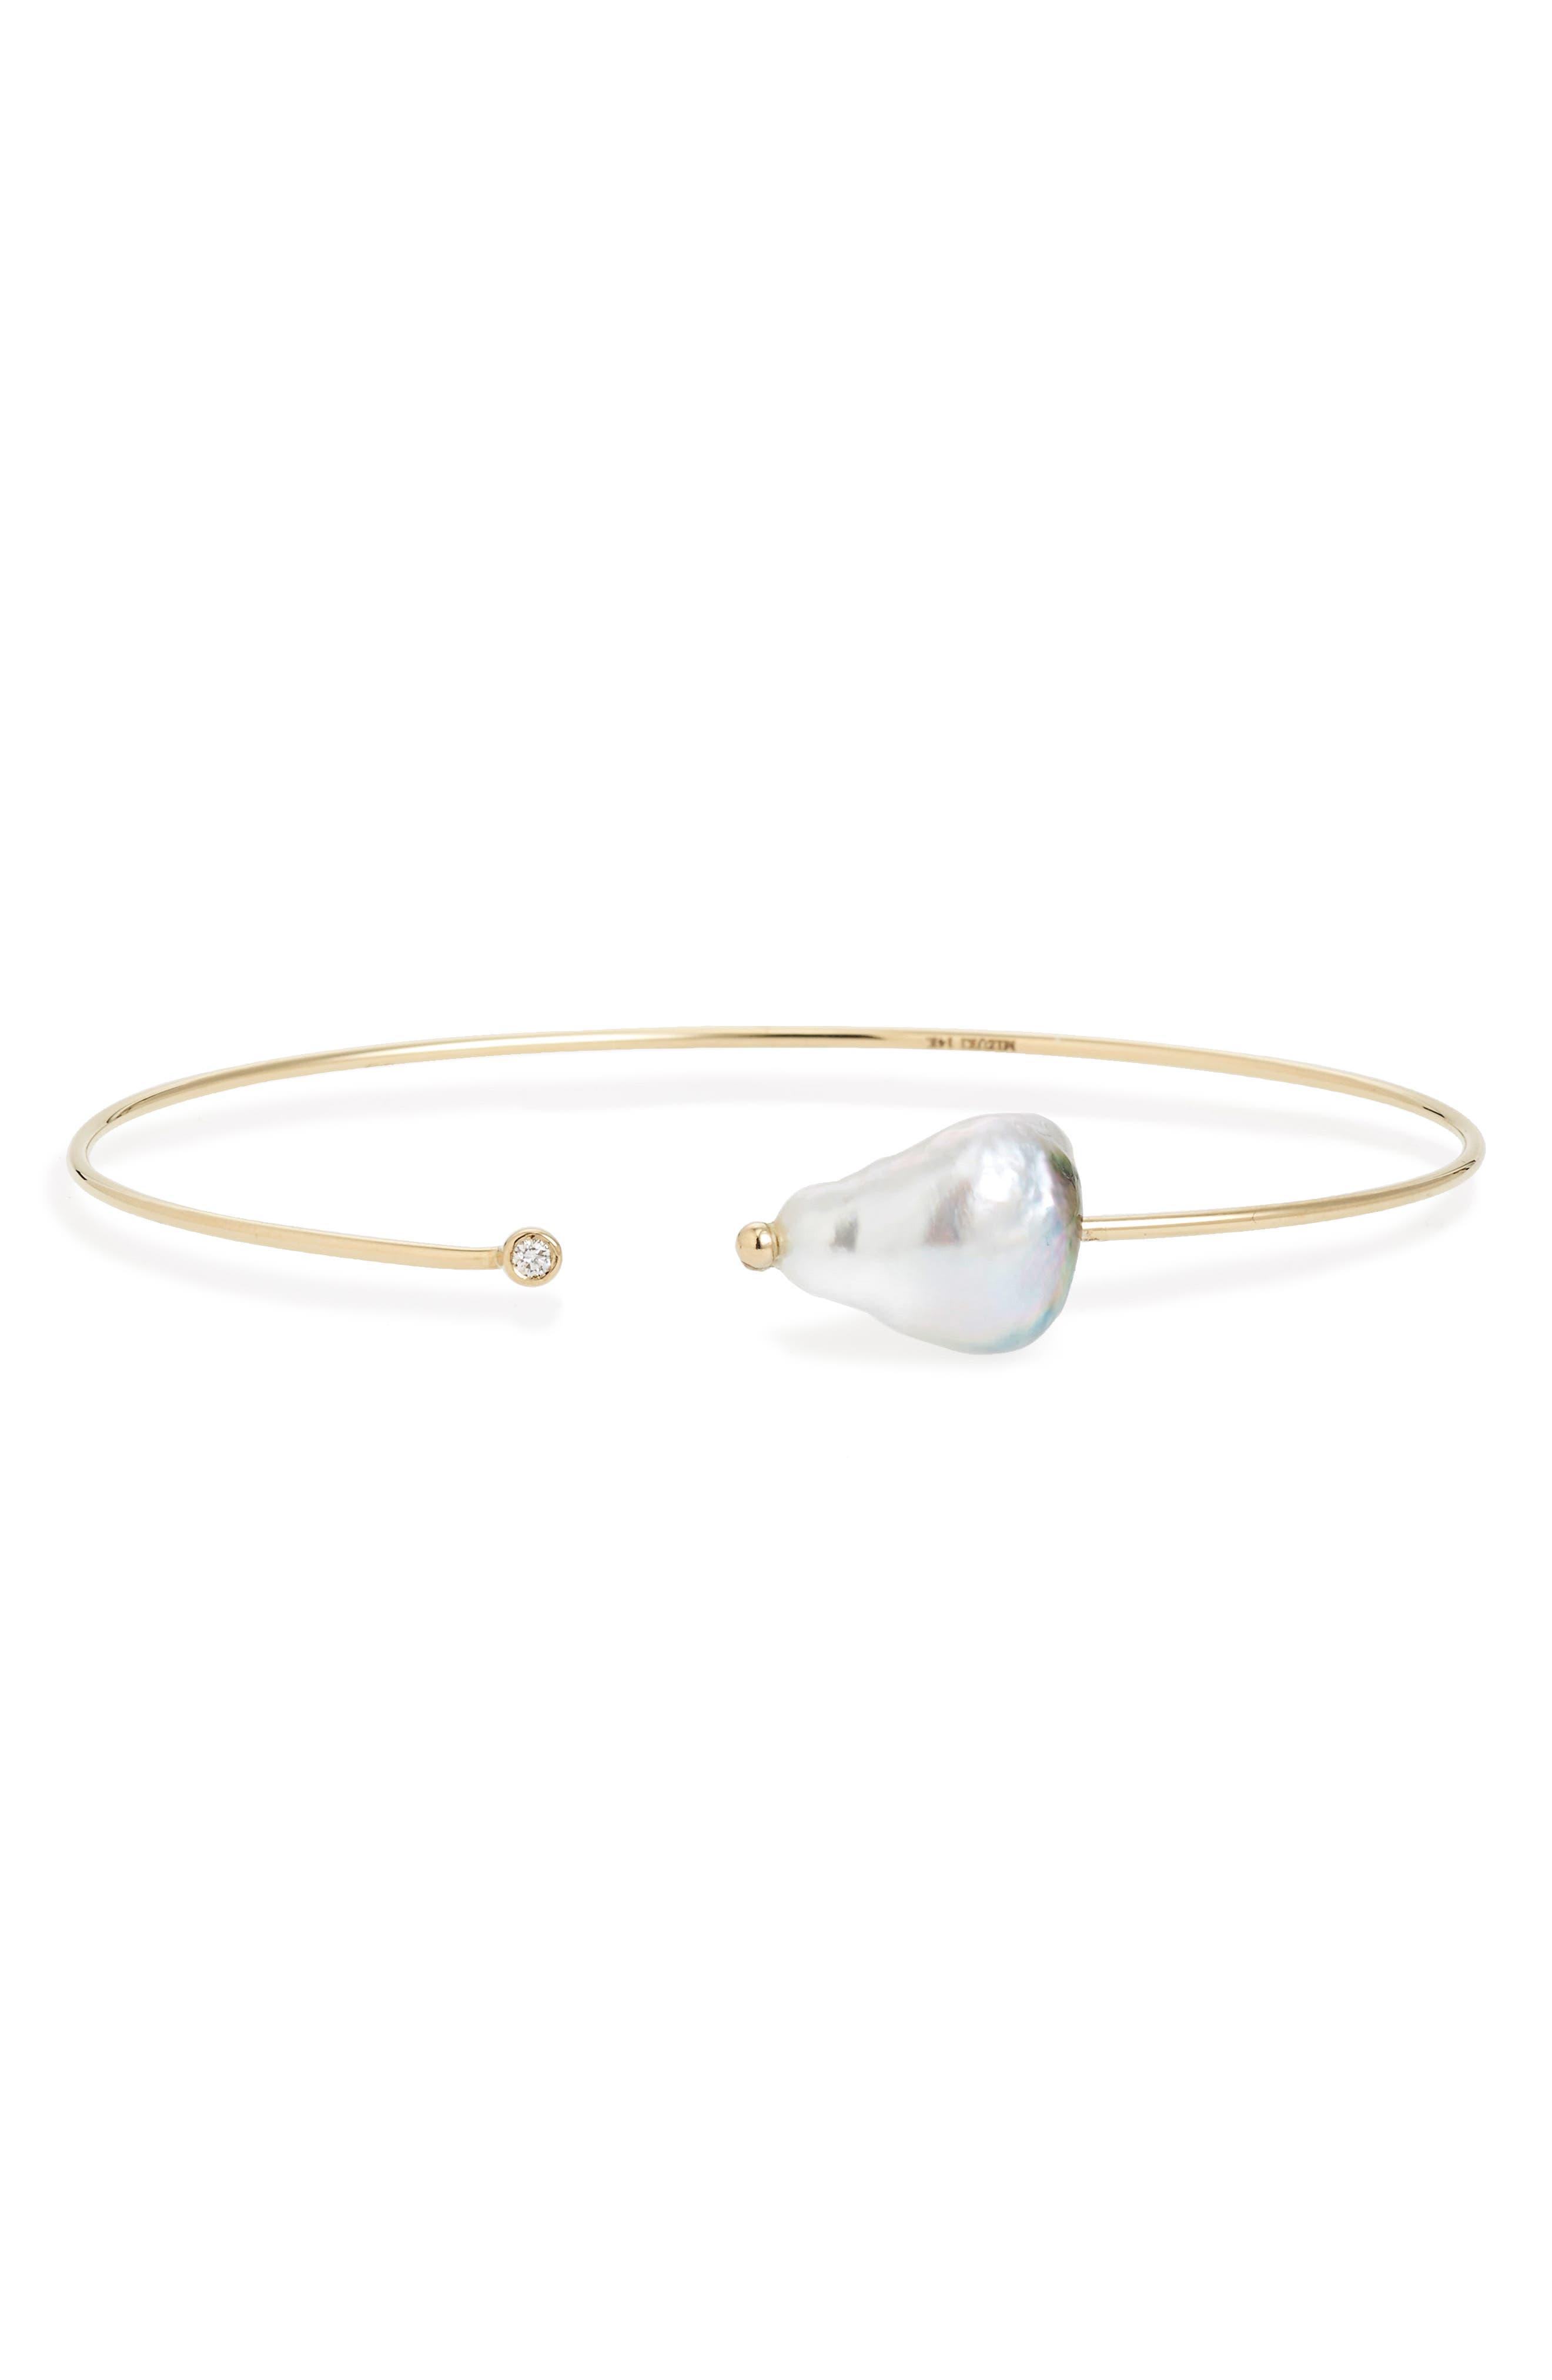 Diamond & Pearl Bracelet,                         Main,                         color, Yellow Gold/ Grey Pearl